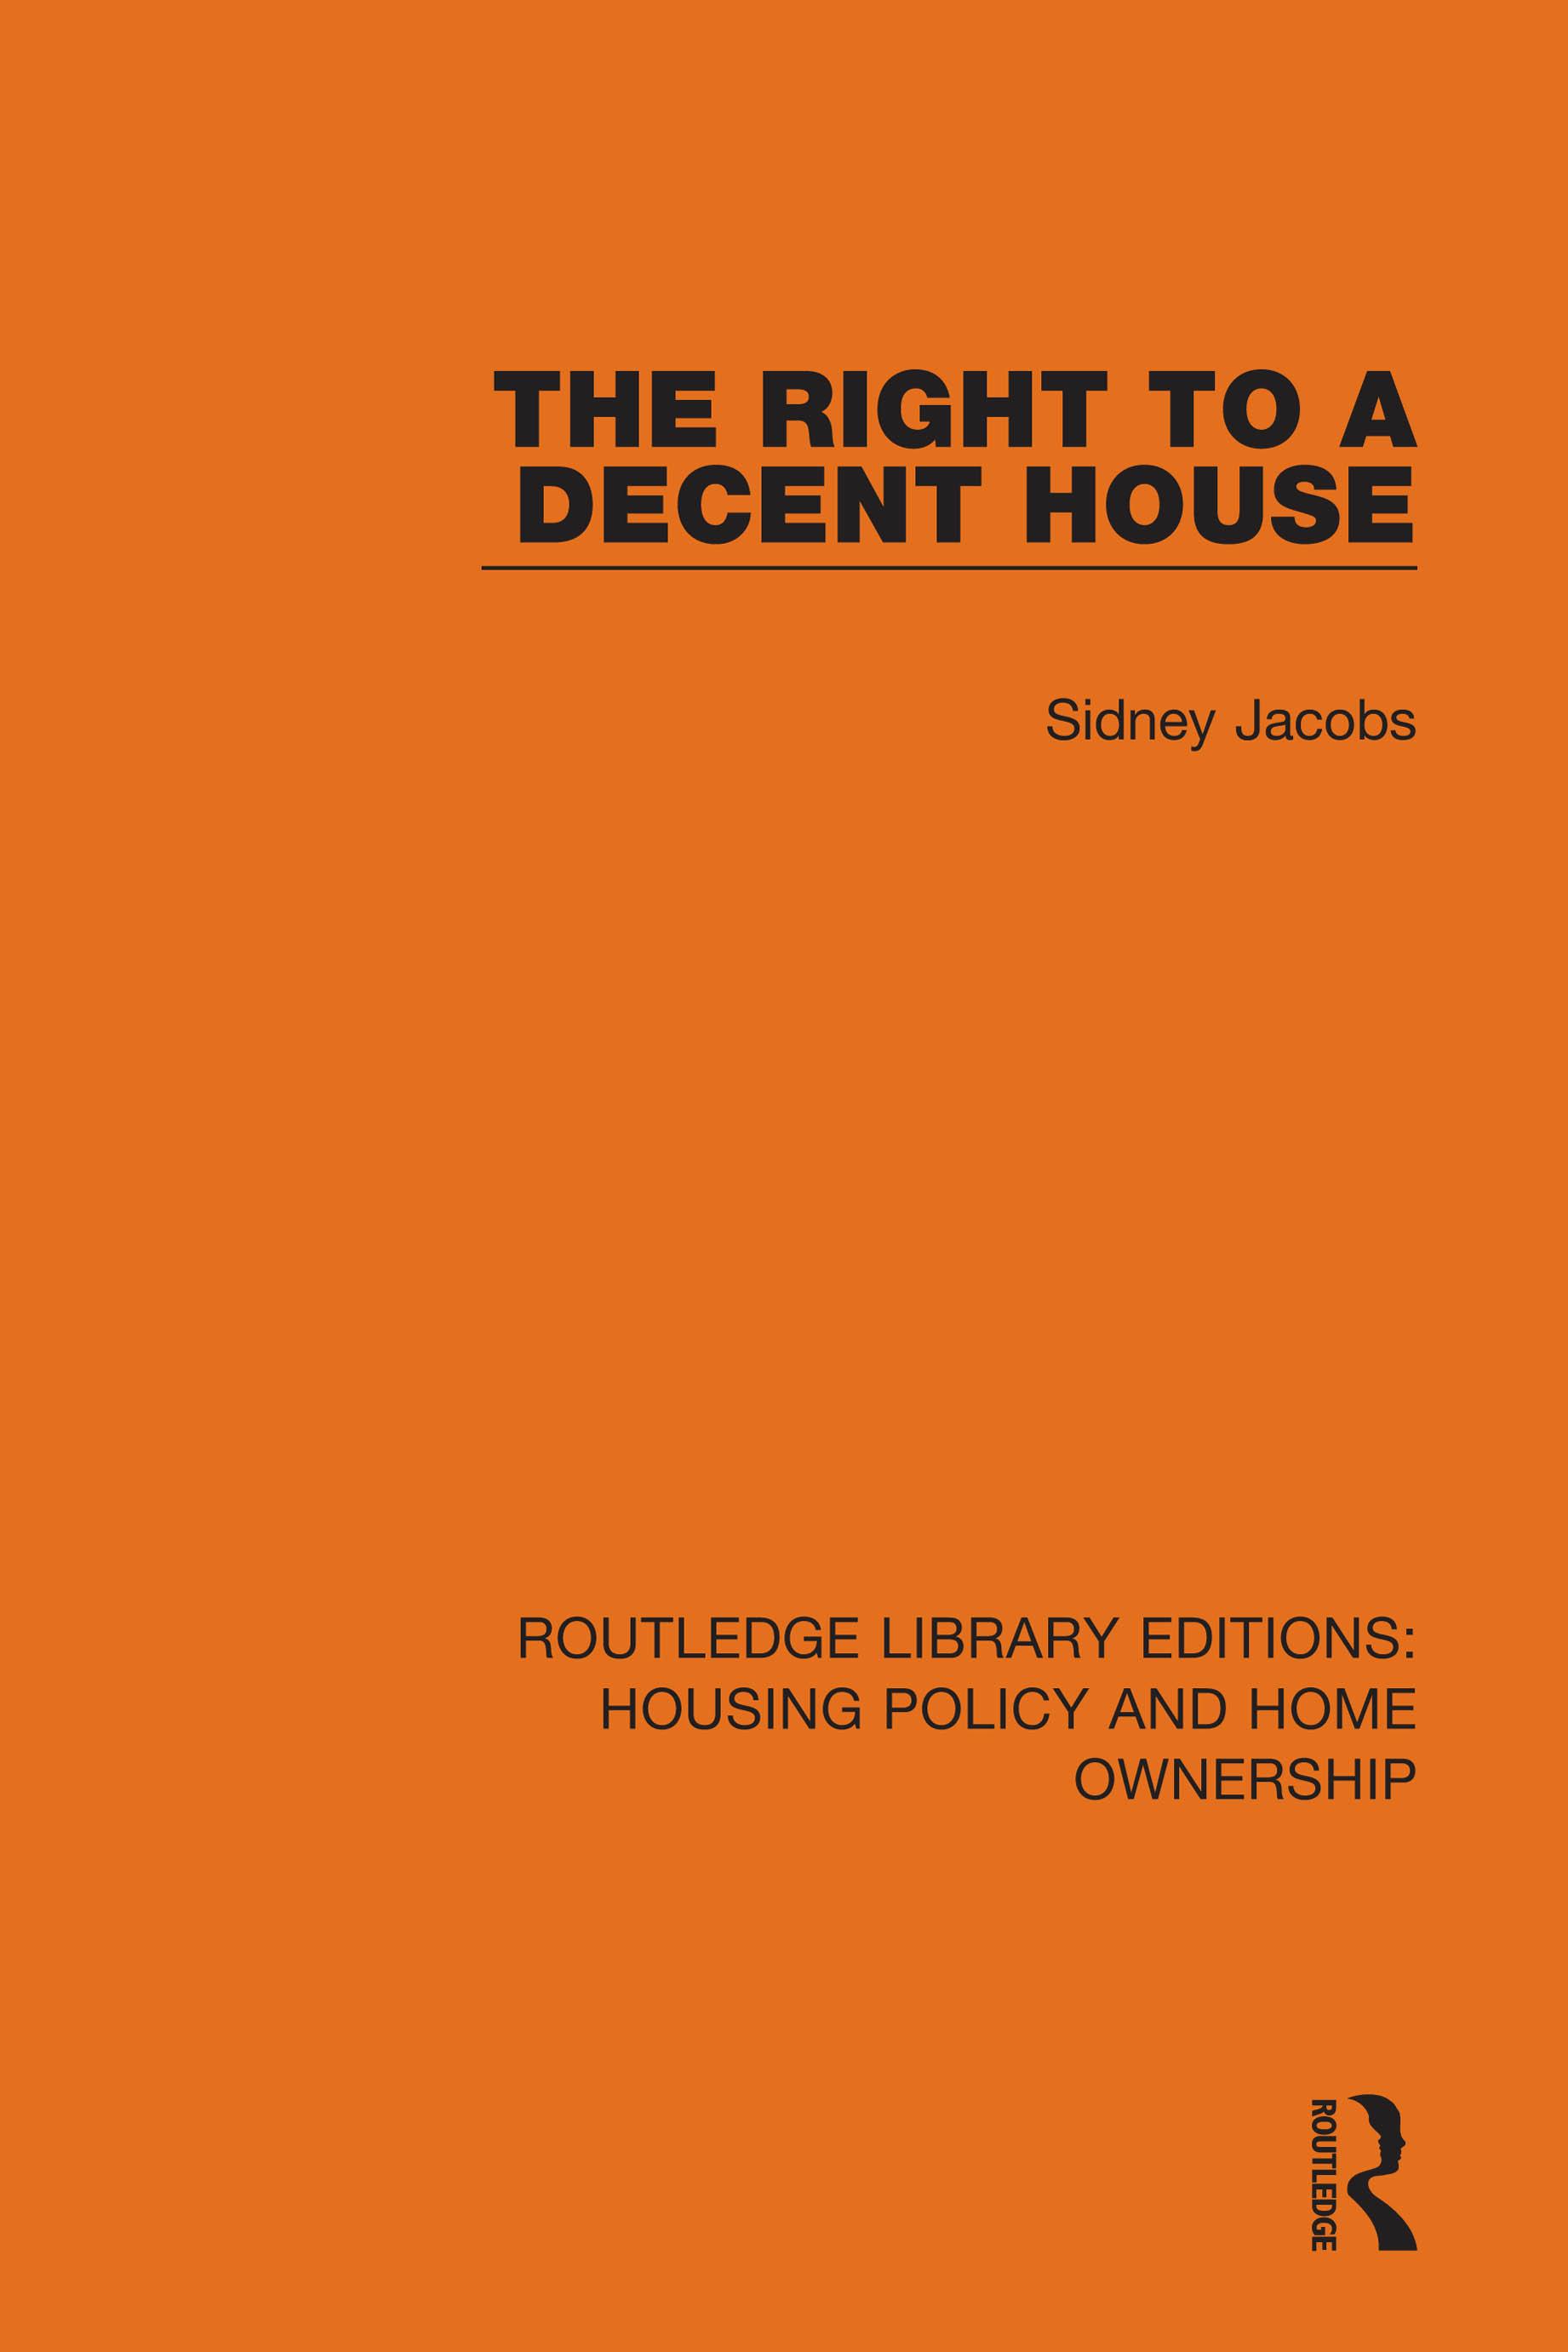 Housing: Shortage, Demand and Bureaucracy